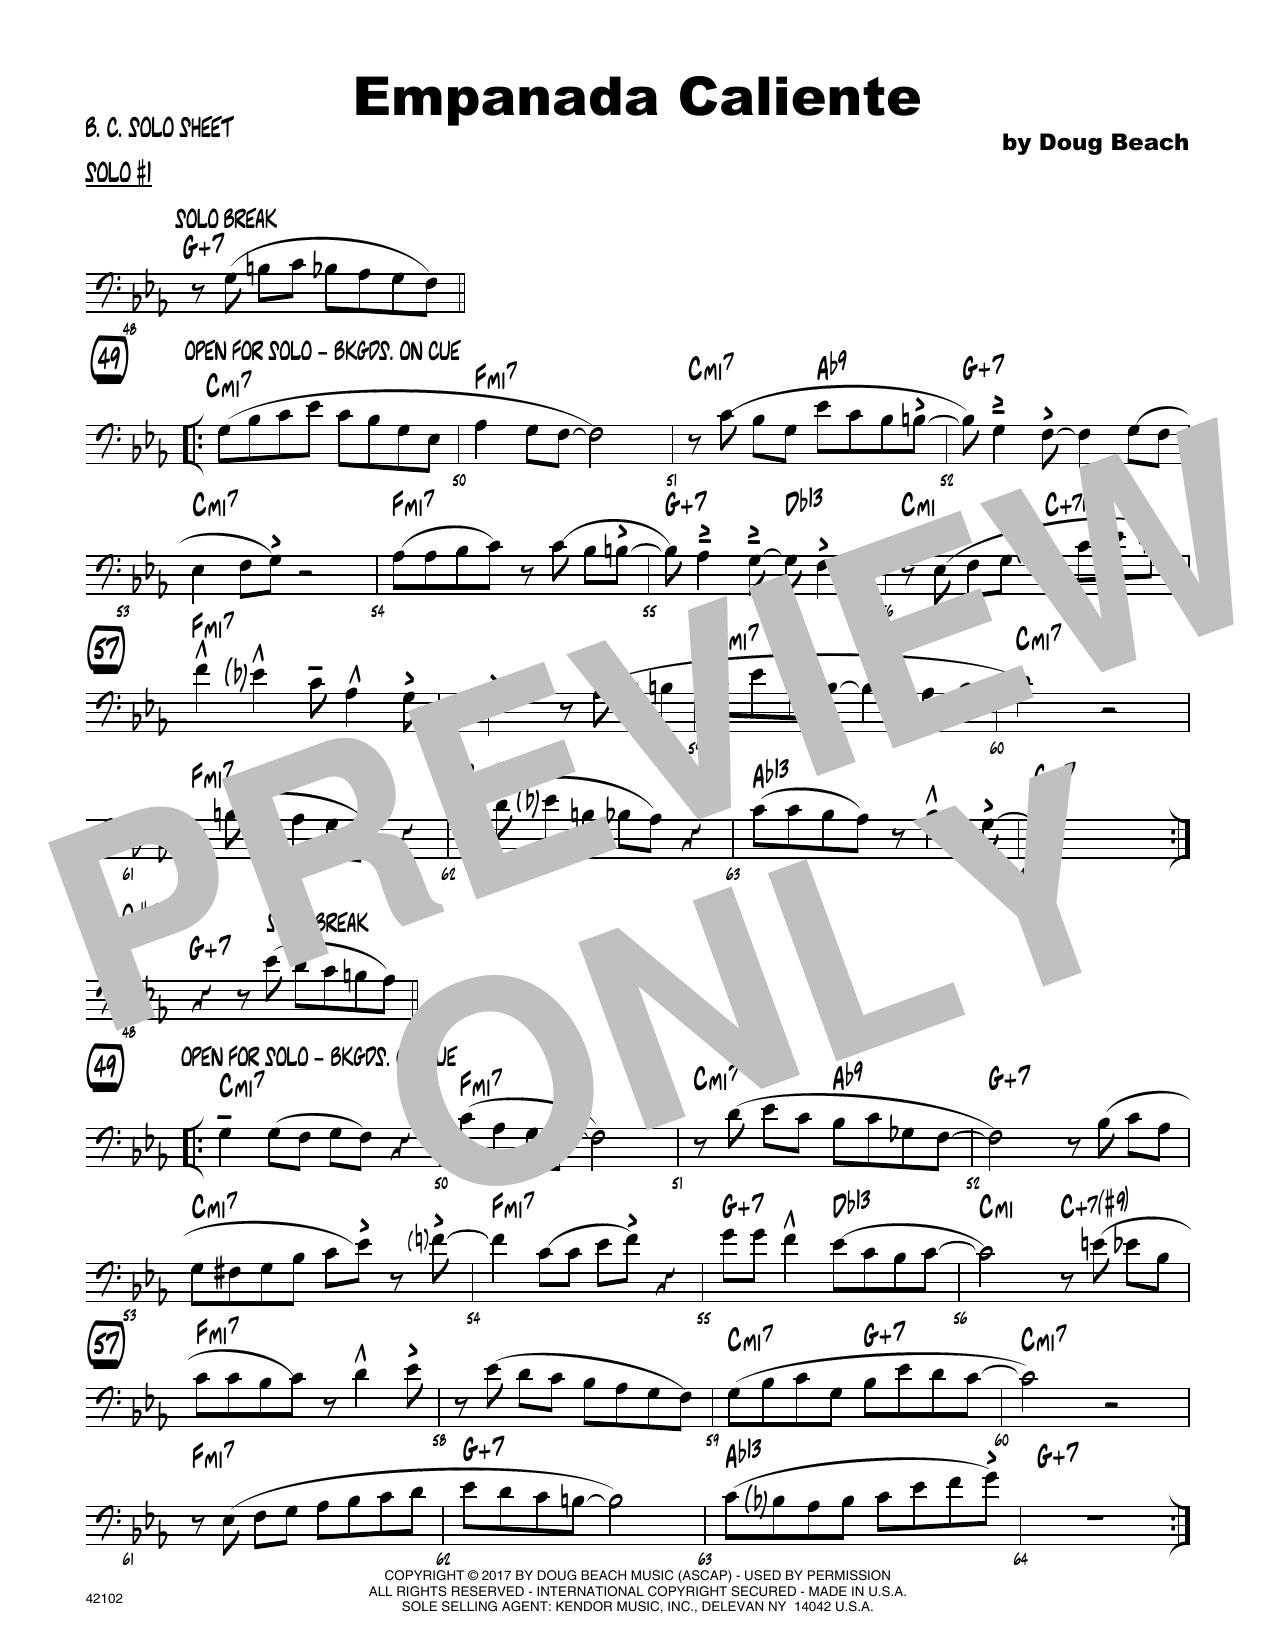 Empanada Caliente - Solo Sheet - Trombone